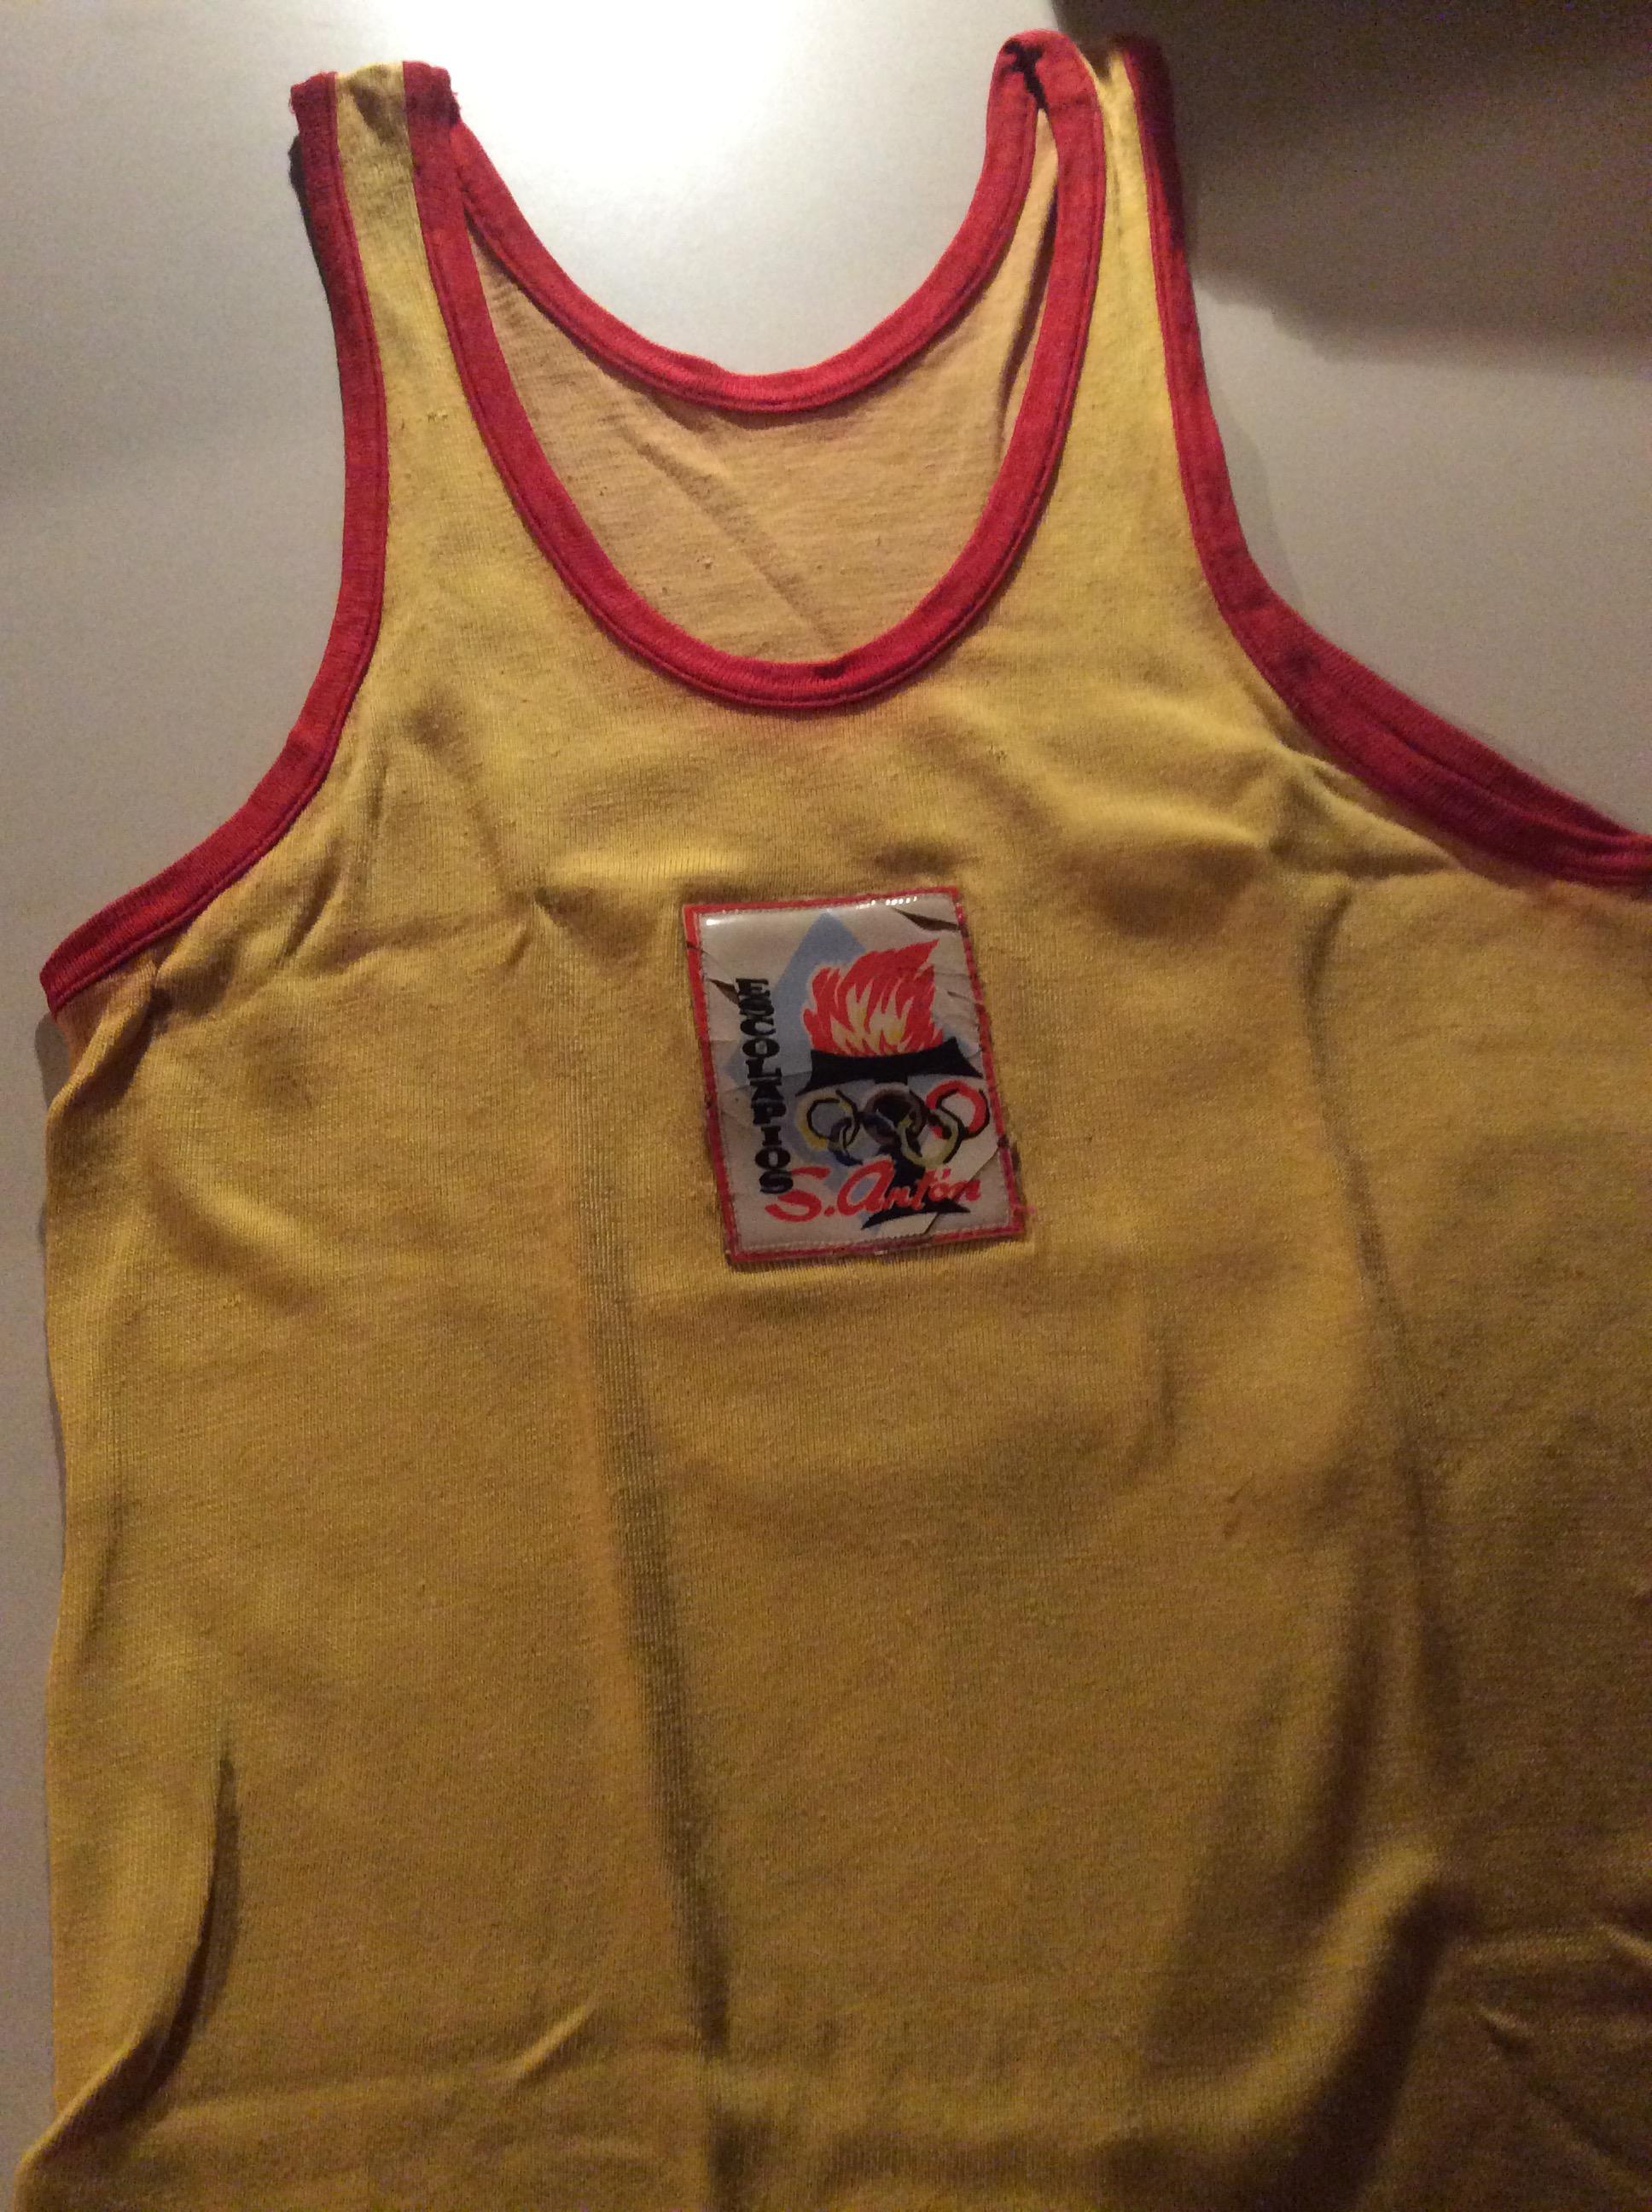 samarreta basquet anys 60